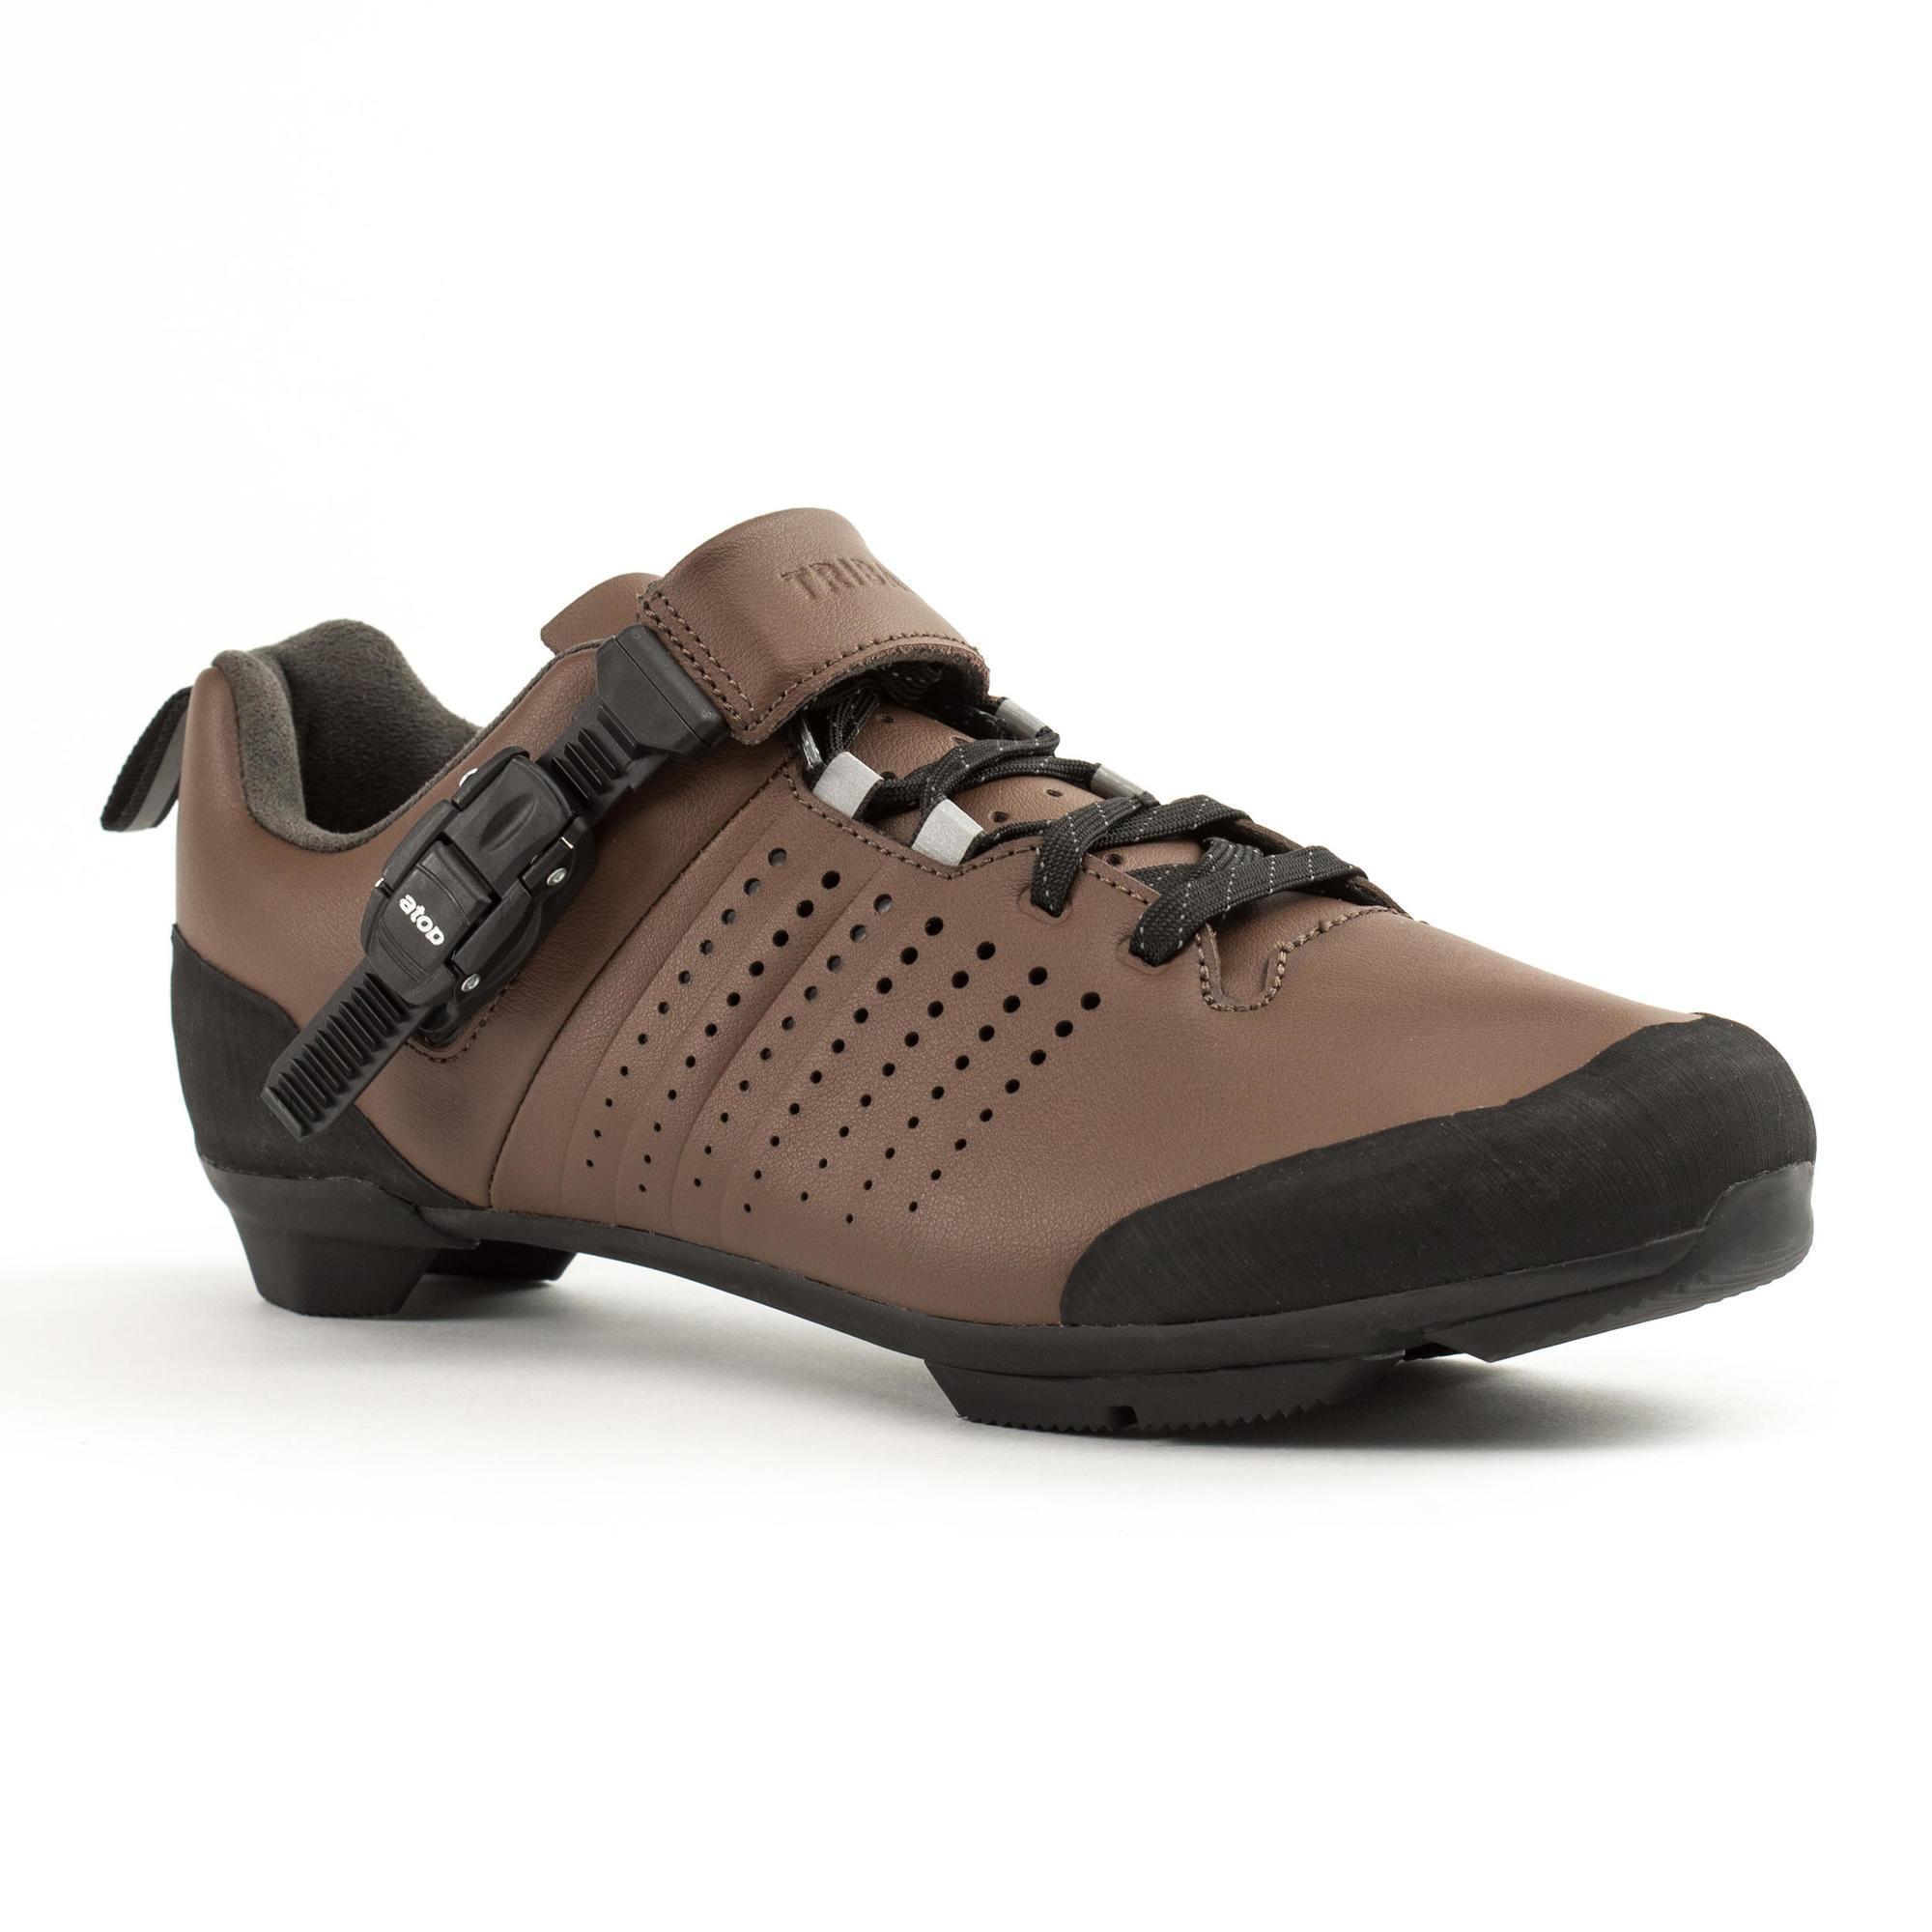 FAHRRADSCHUHE RENNRAD RC 520 (für SPD Cleats) Braun Leder   Schuhe > Sportschuhe > Fahrradschuhe   Braun   Leder - La   Triban